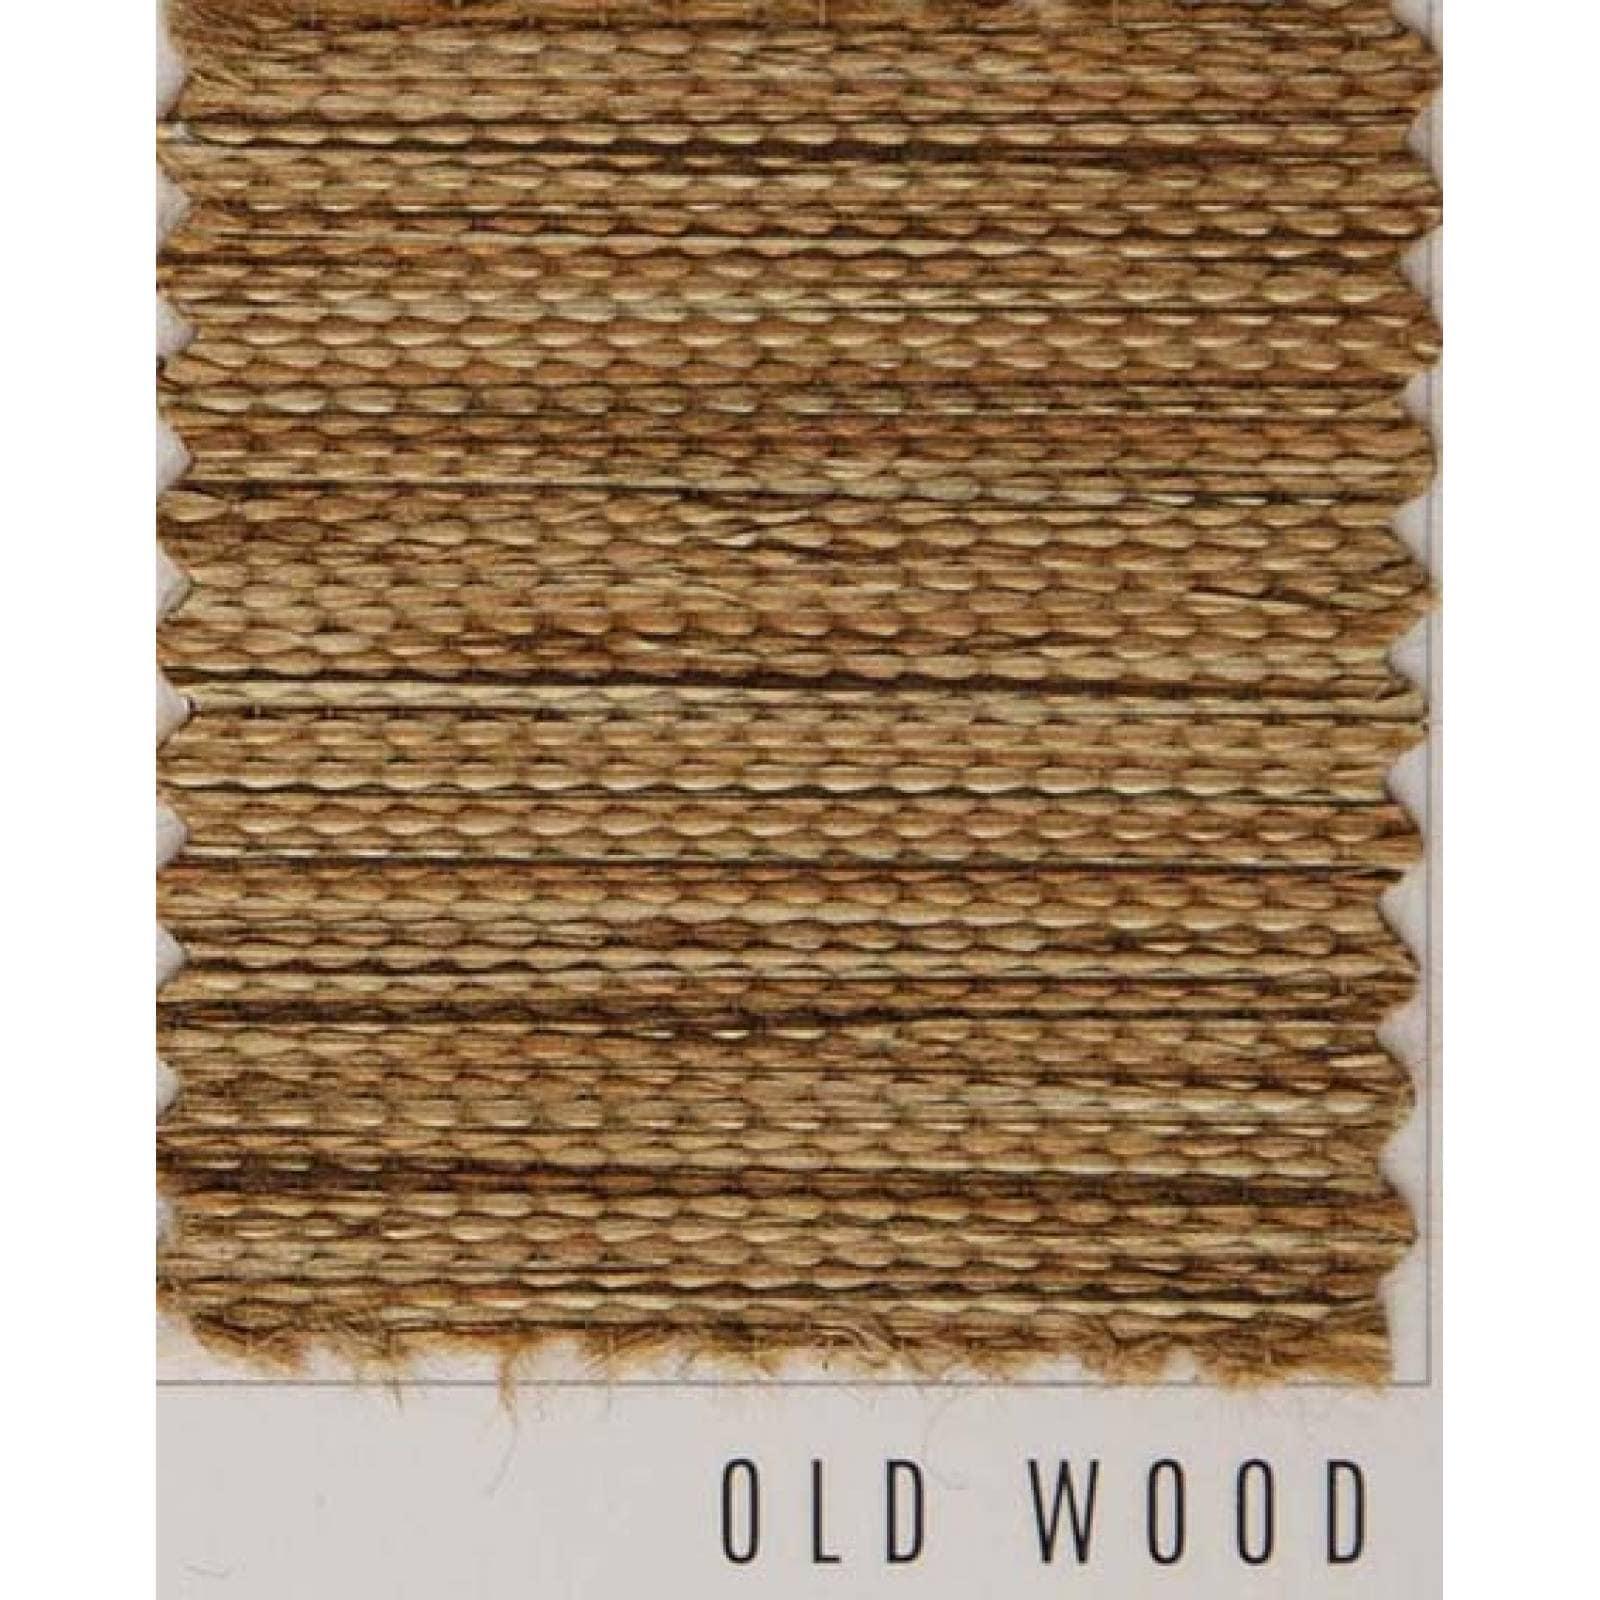 Persianas Sheer Elegance modelo Wood line 140 cm de ancho X hasta 170 cm de largo